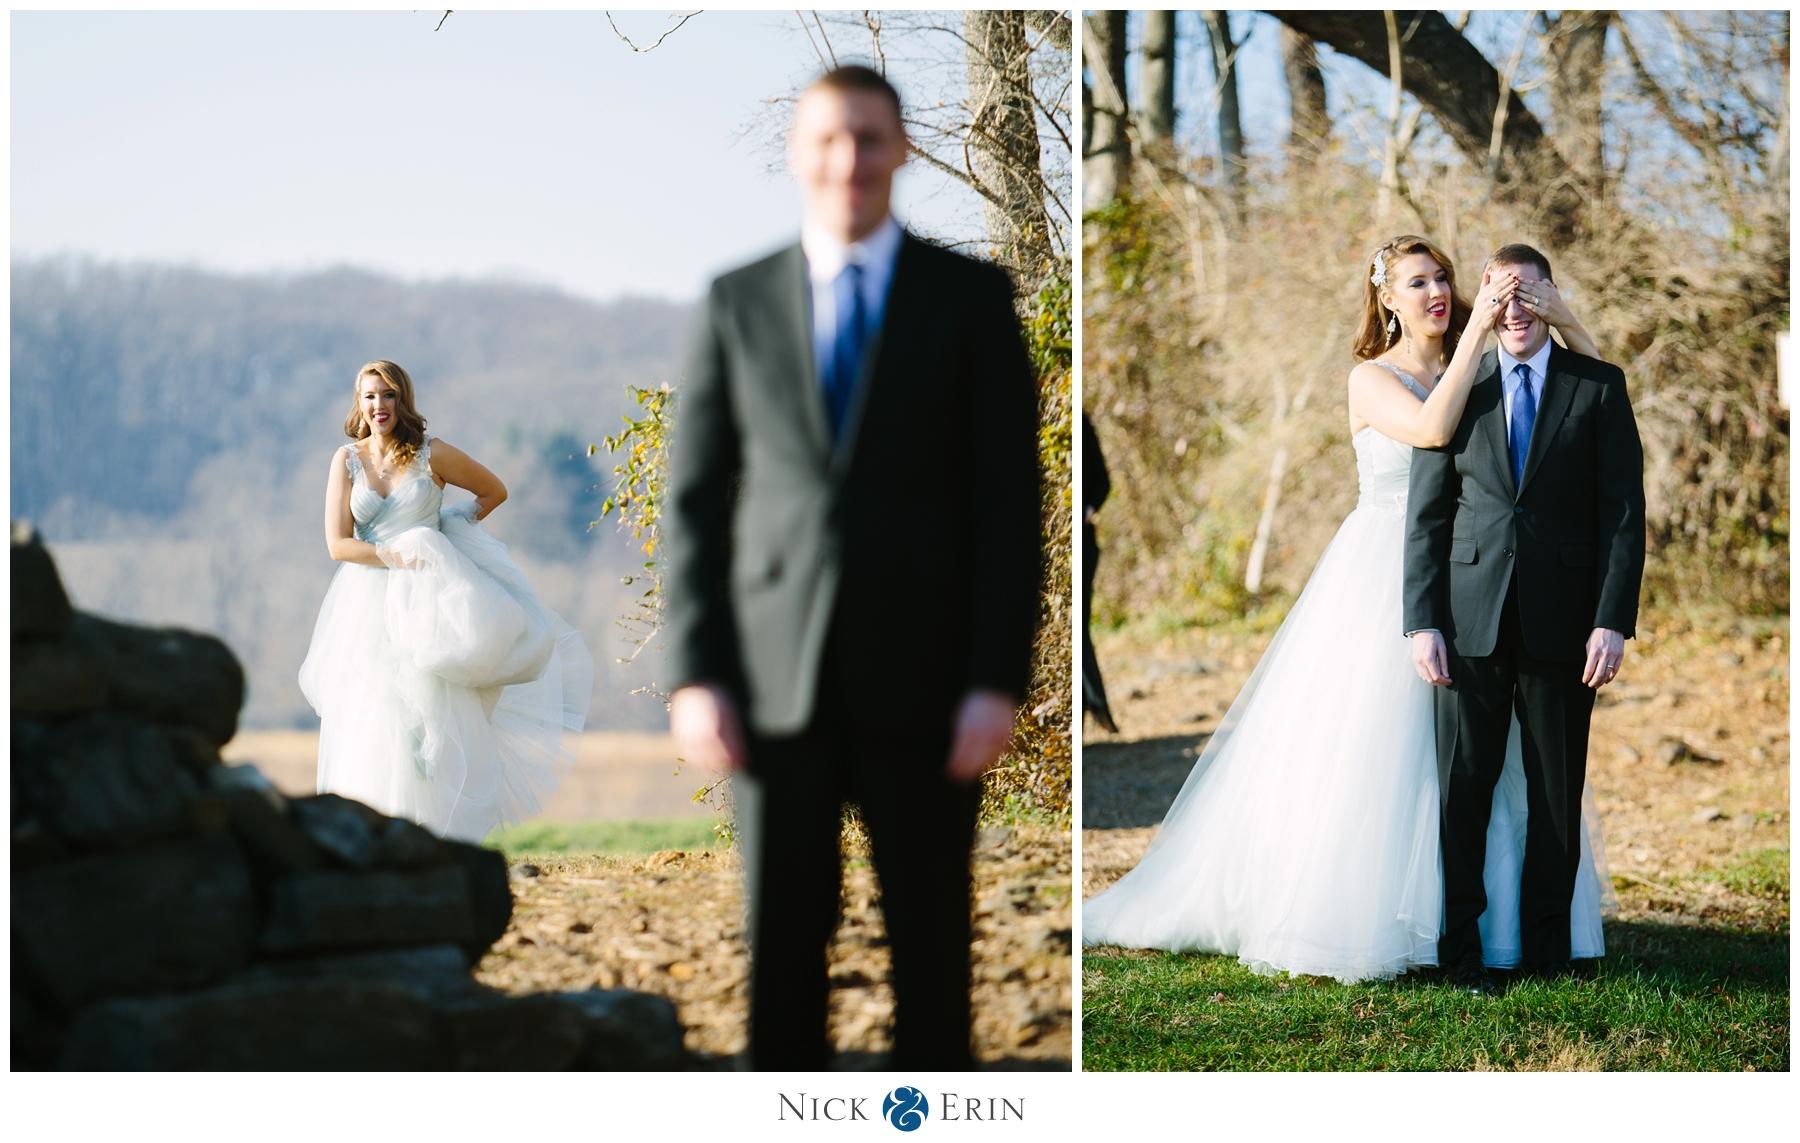 Donner_Photography_Mendenhall Inn Wedding_Blake & Kristina_0021